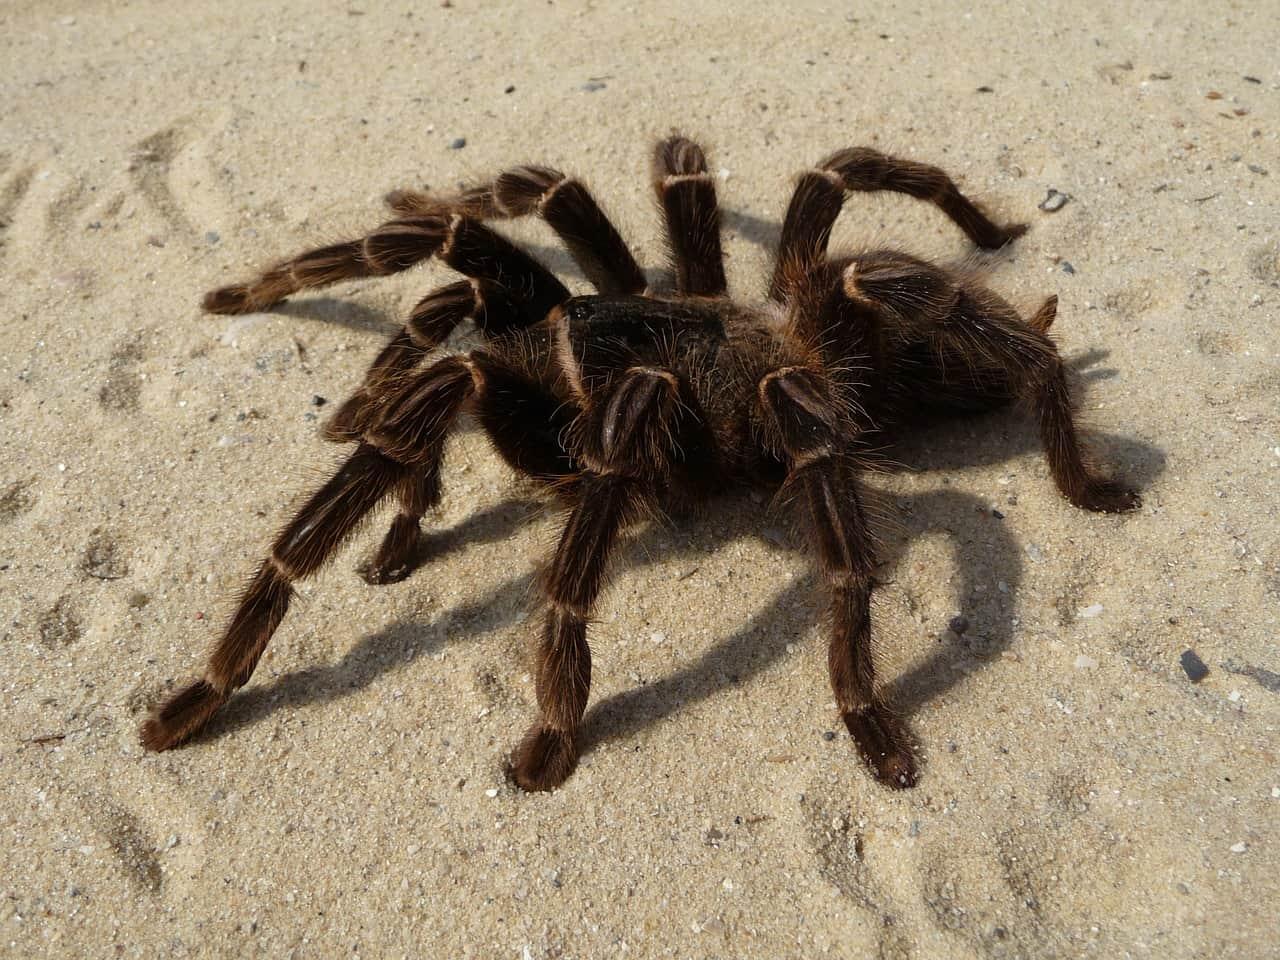 Tarantula_Archnid_Spider